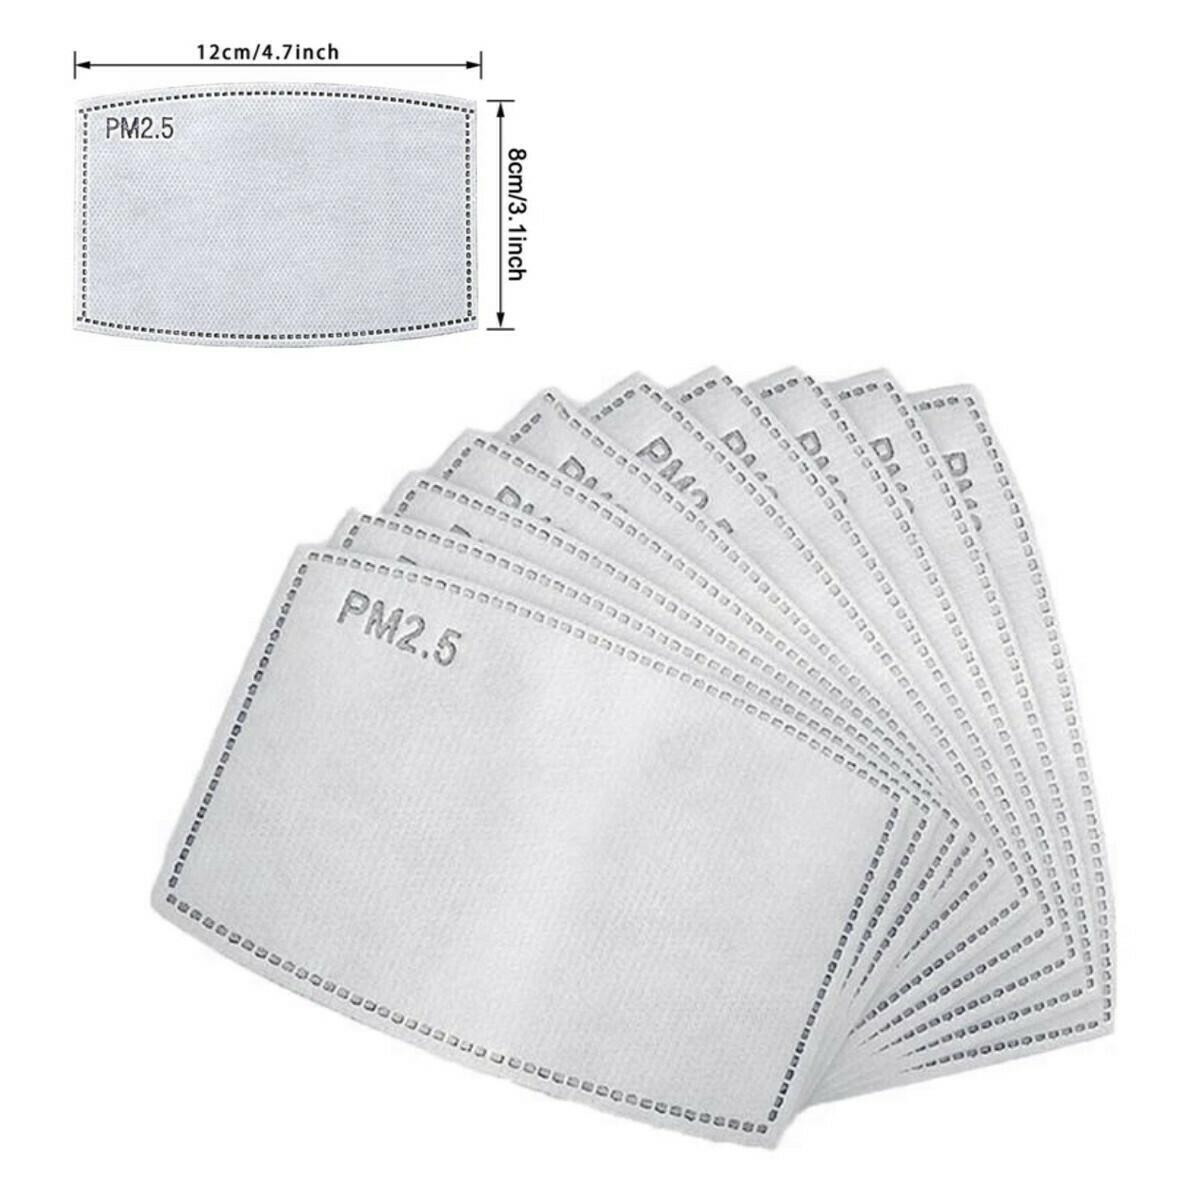 Mask Filter - 10 pack Adult Size